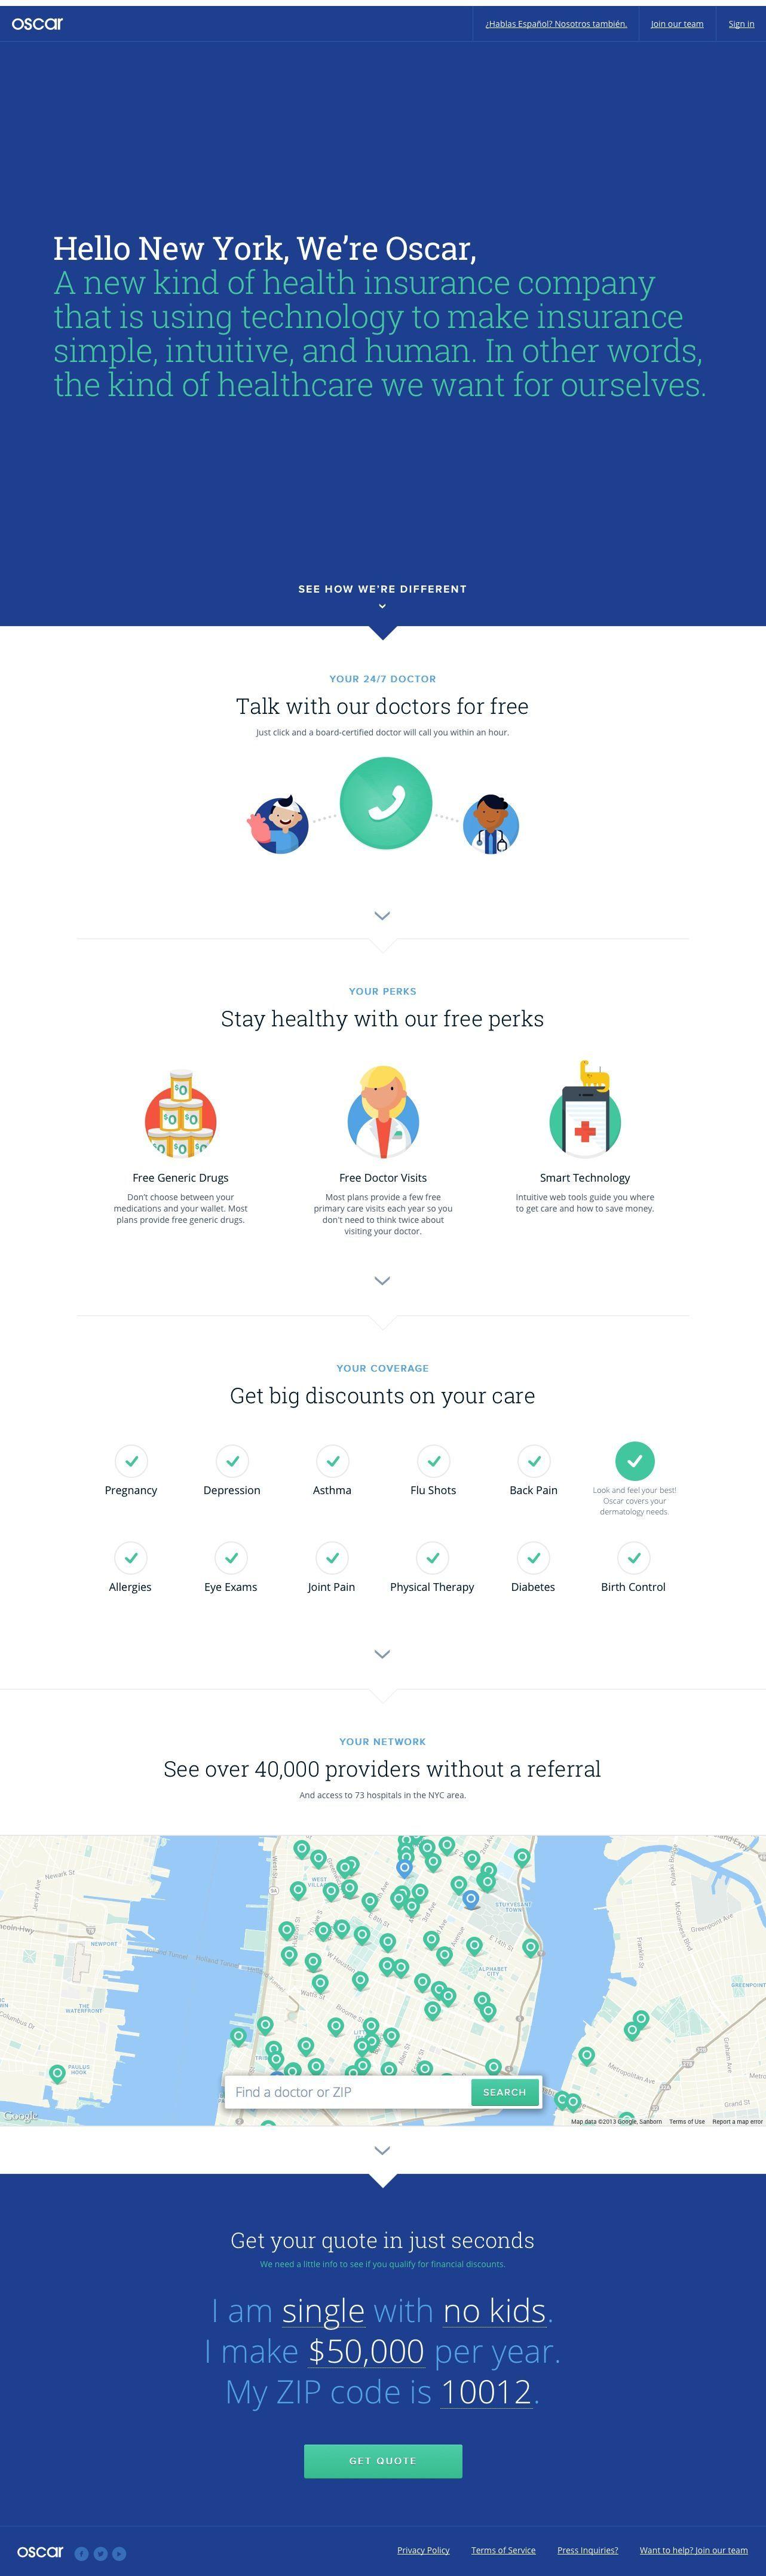 Good no cost oscar health insurance for new yorkjpg